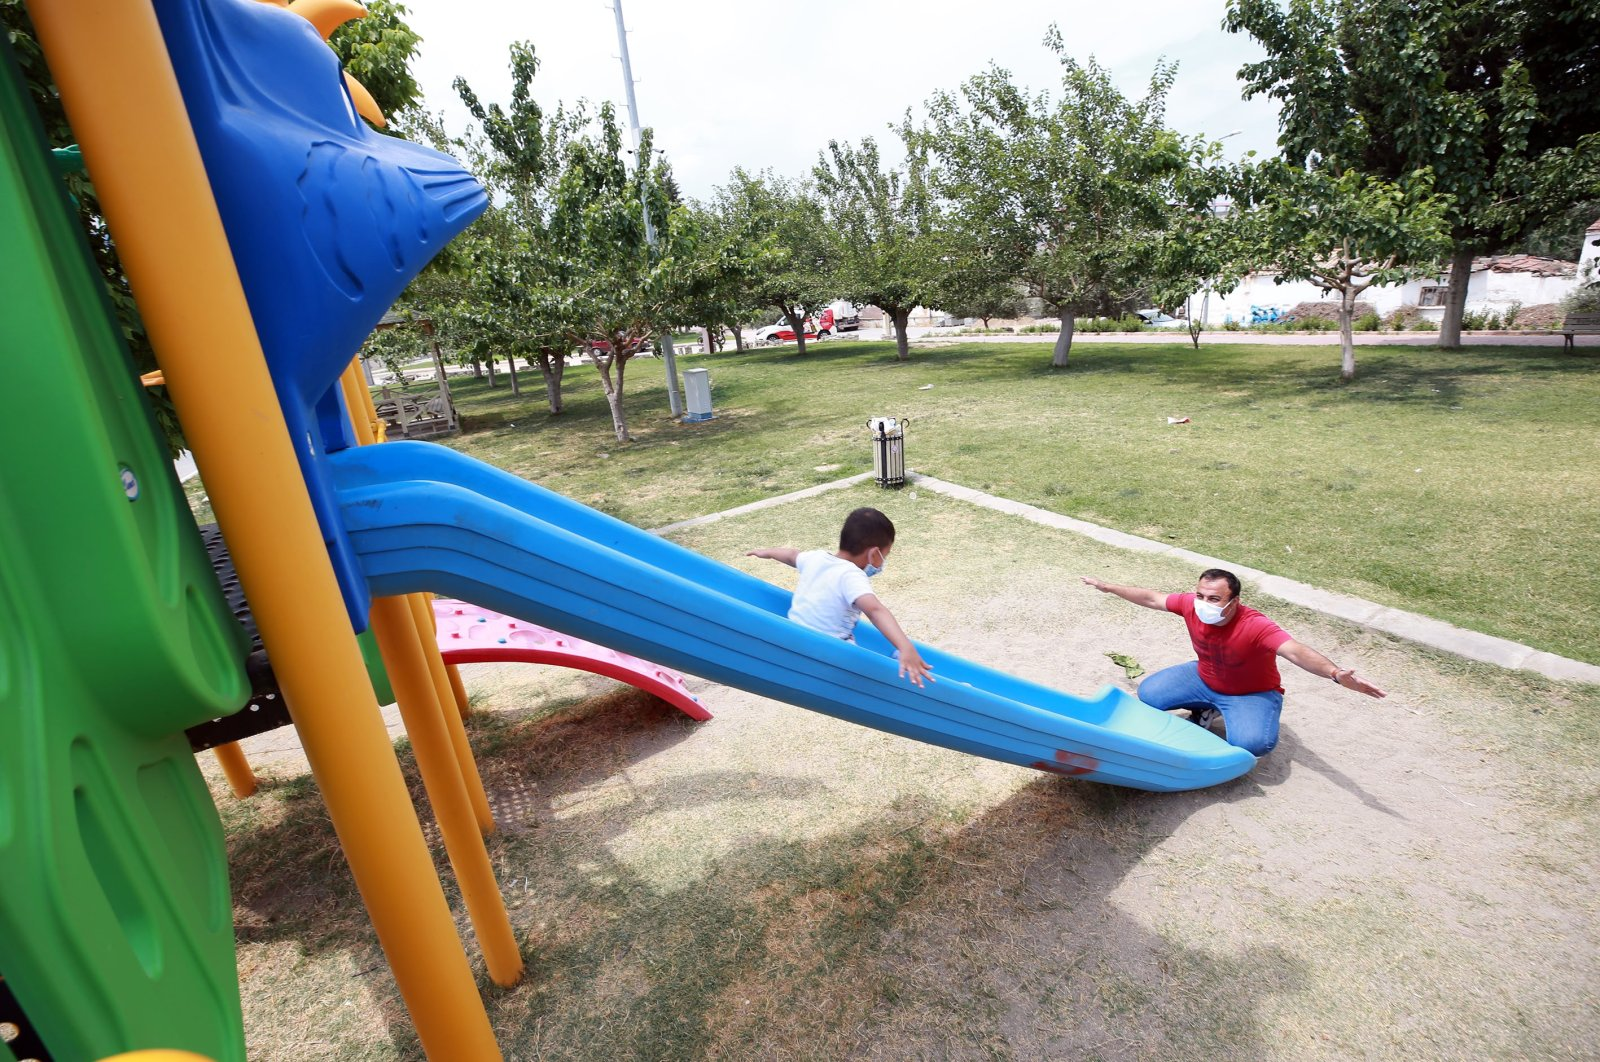 Muammer Yalçın plays with his son at a playground, in Aydın, western Turkey, June 20, 2021. (AA PHOTO)